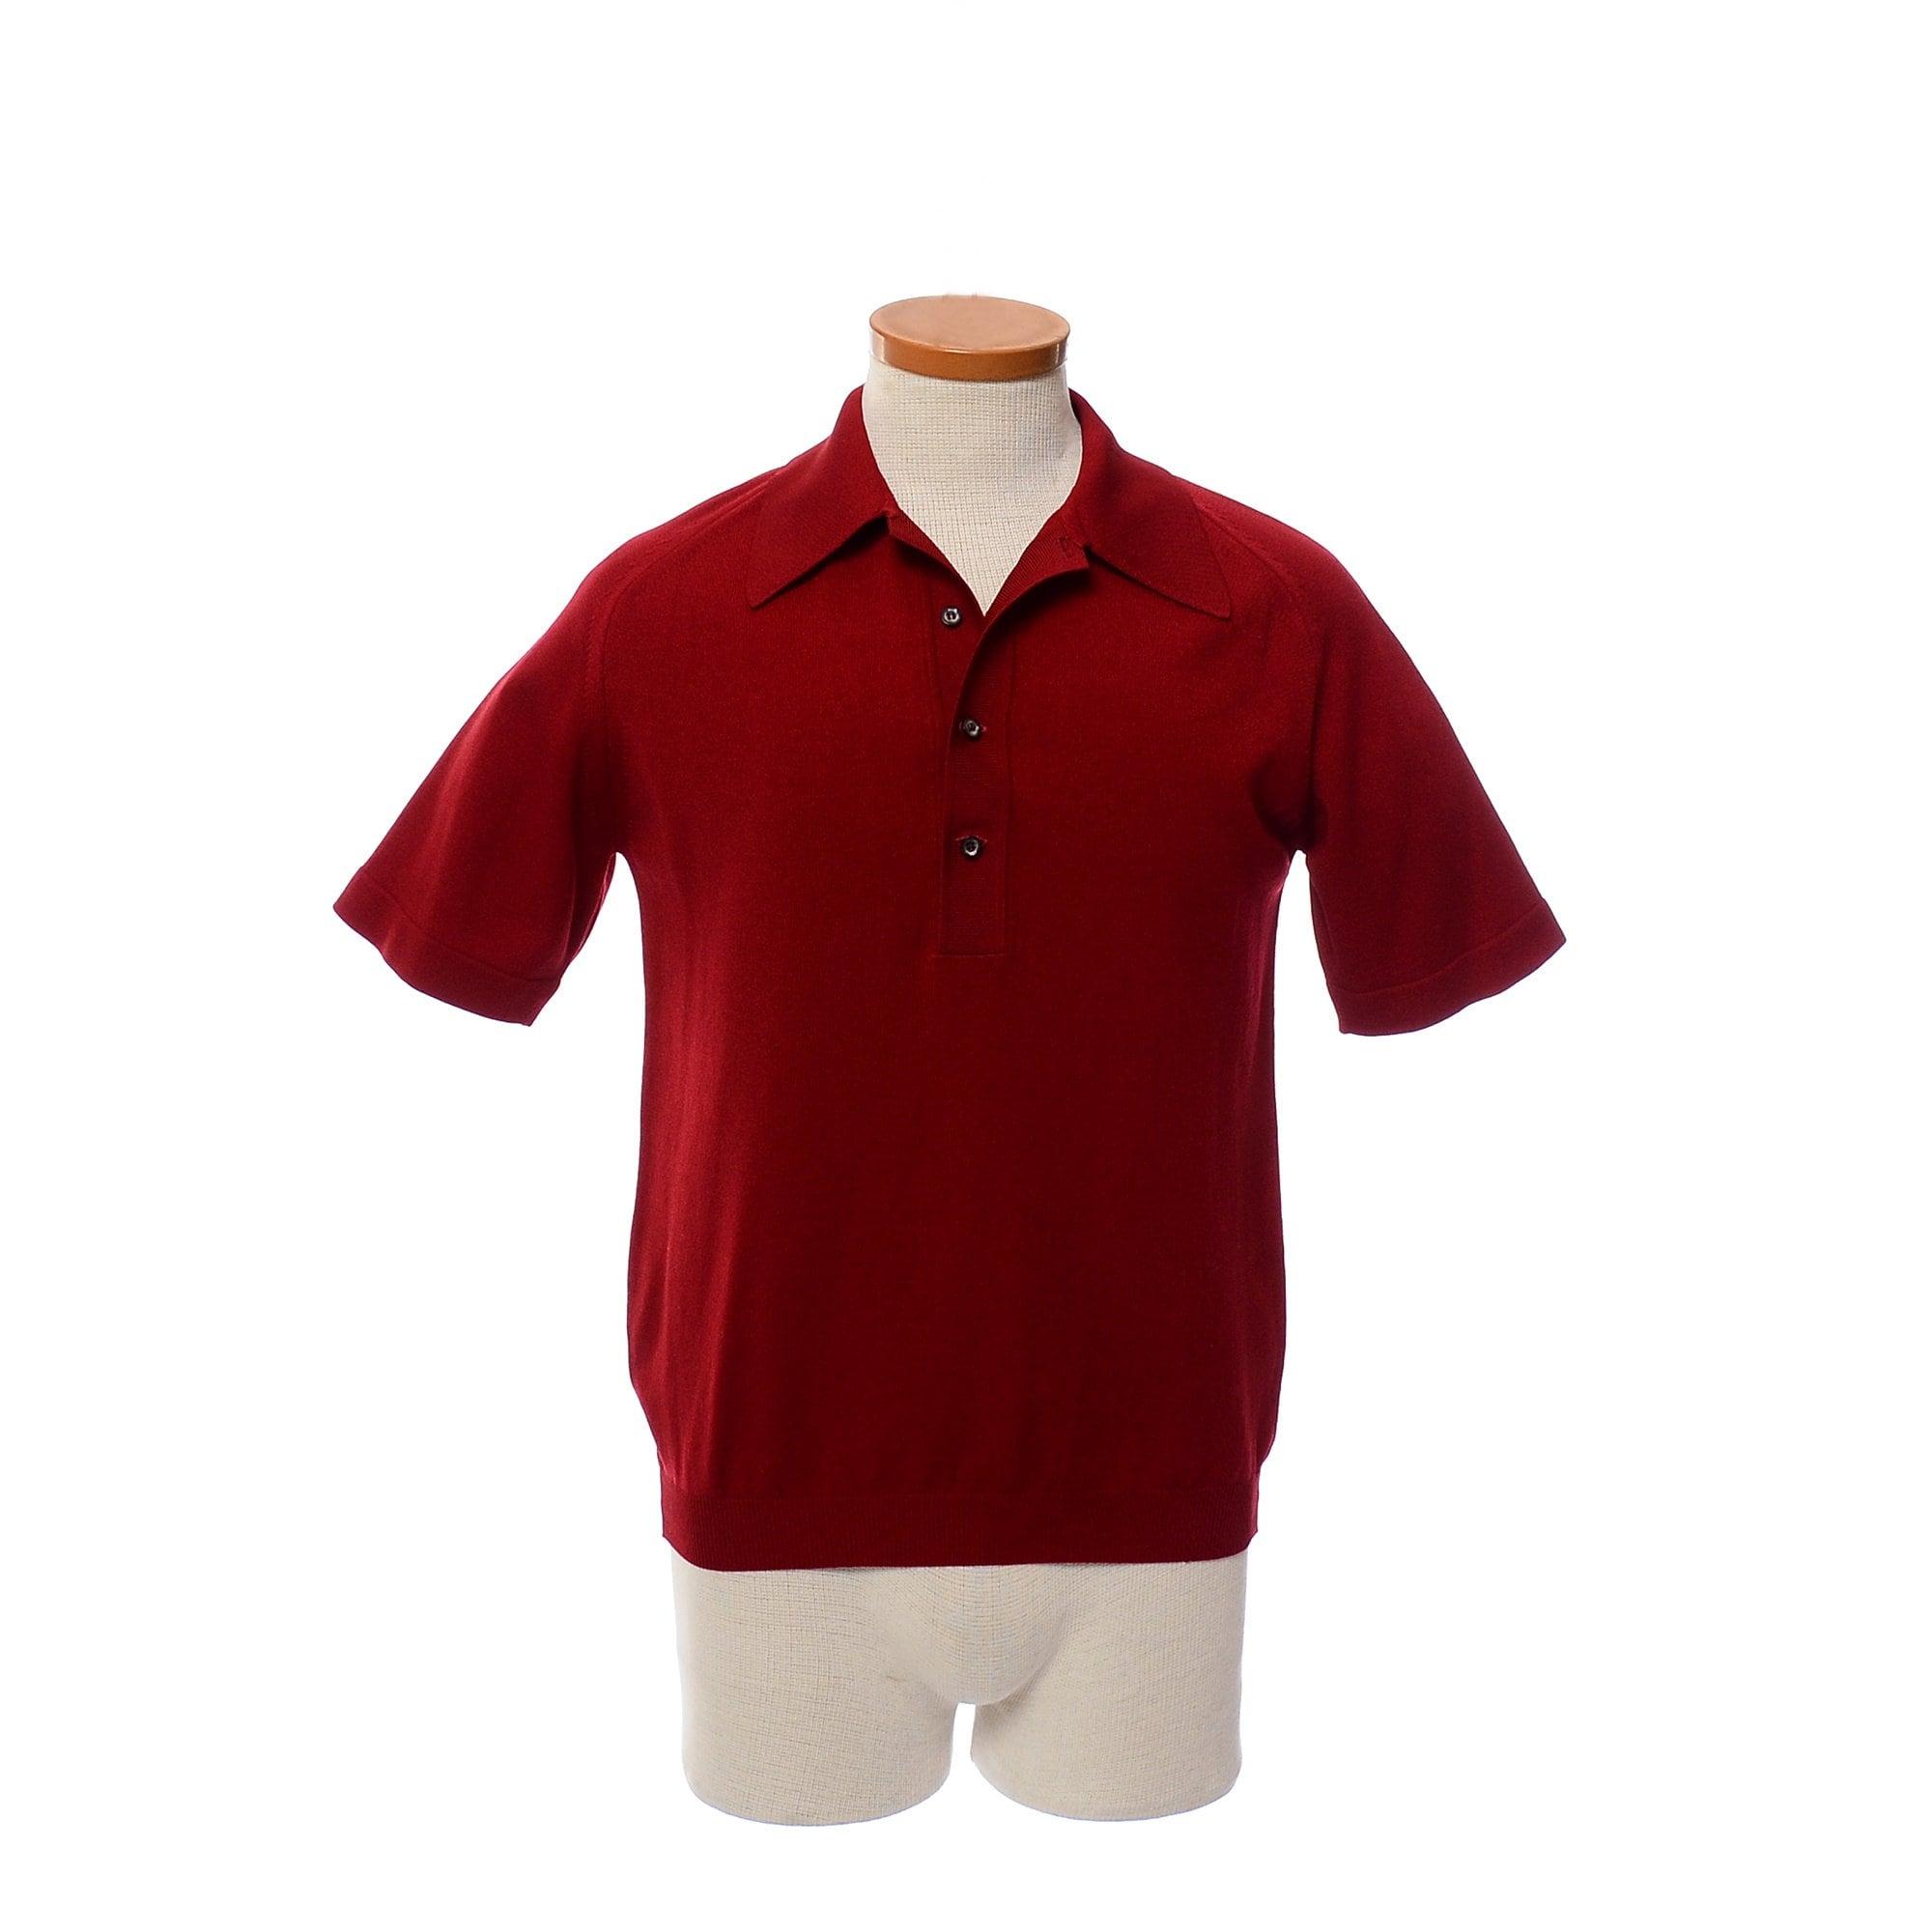 40cee3a32 60s Puritan Ban Lon Knit Polo Shirt Vintage Ansetta Burgundy